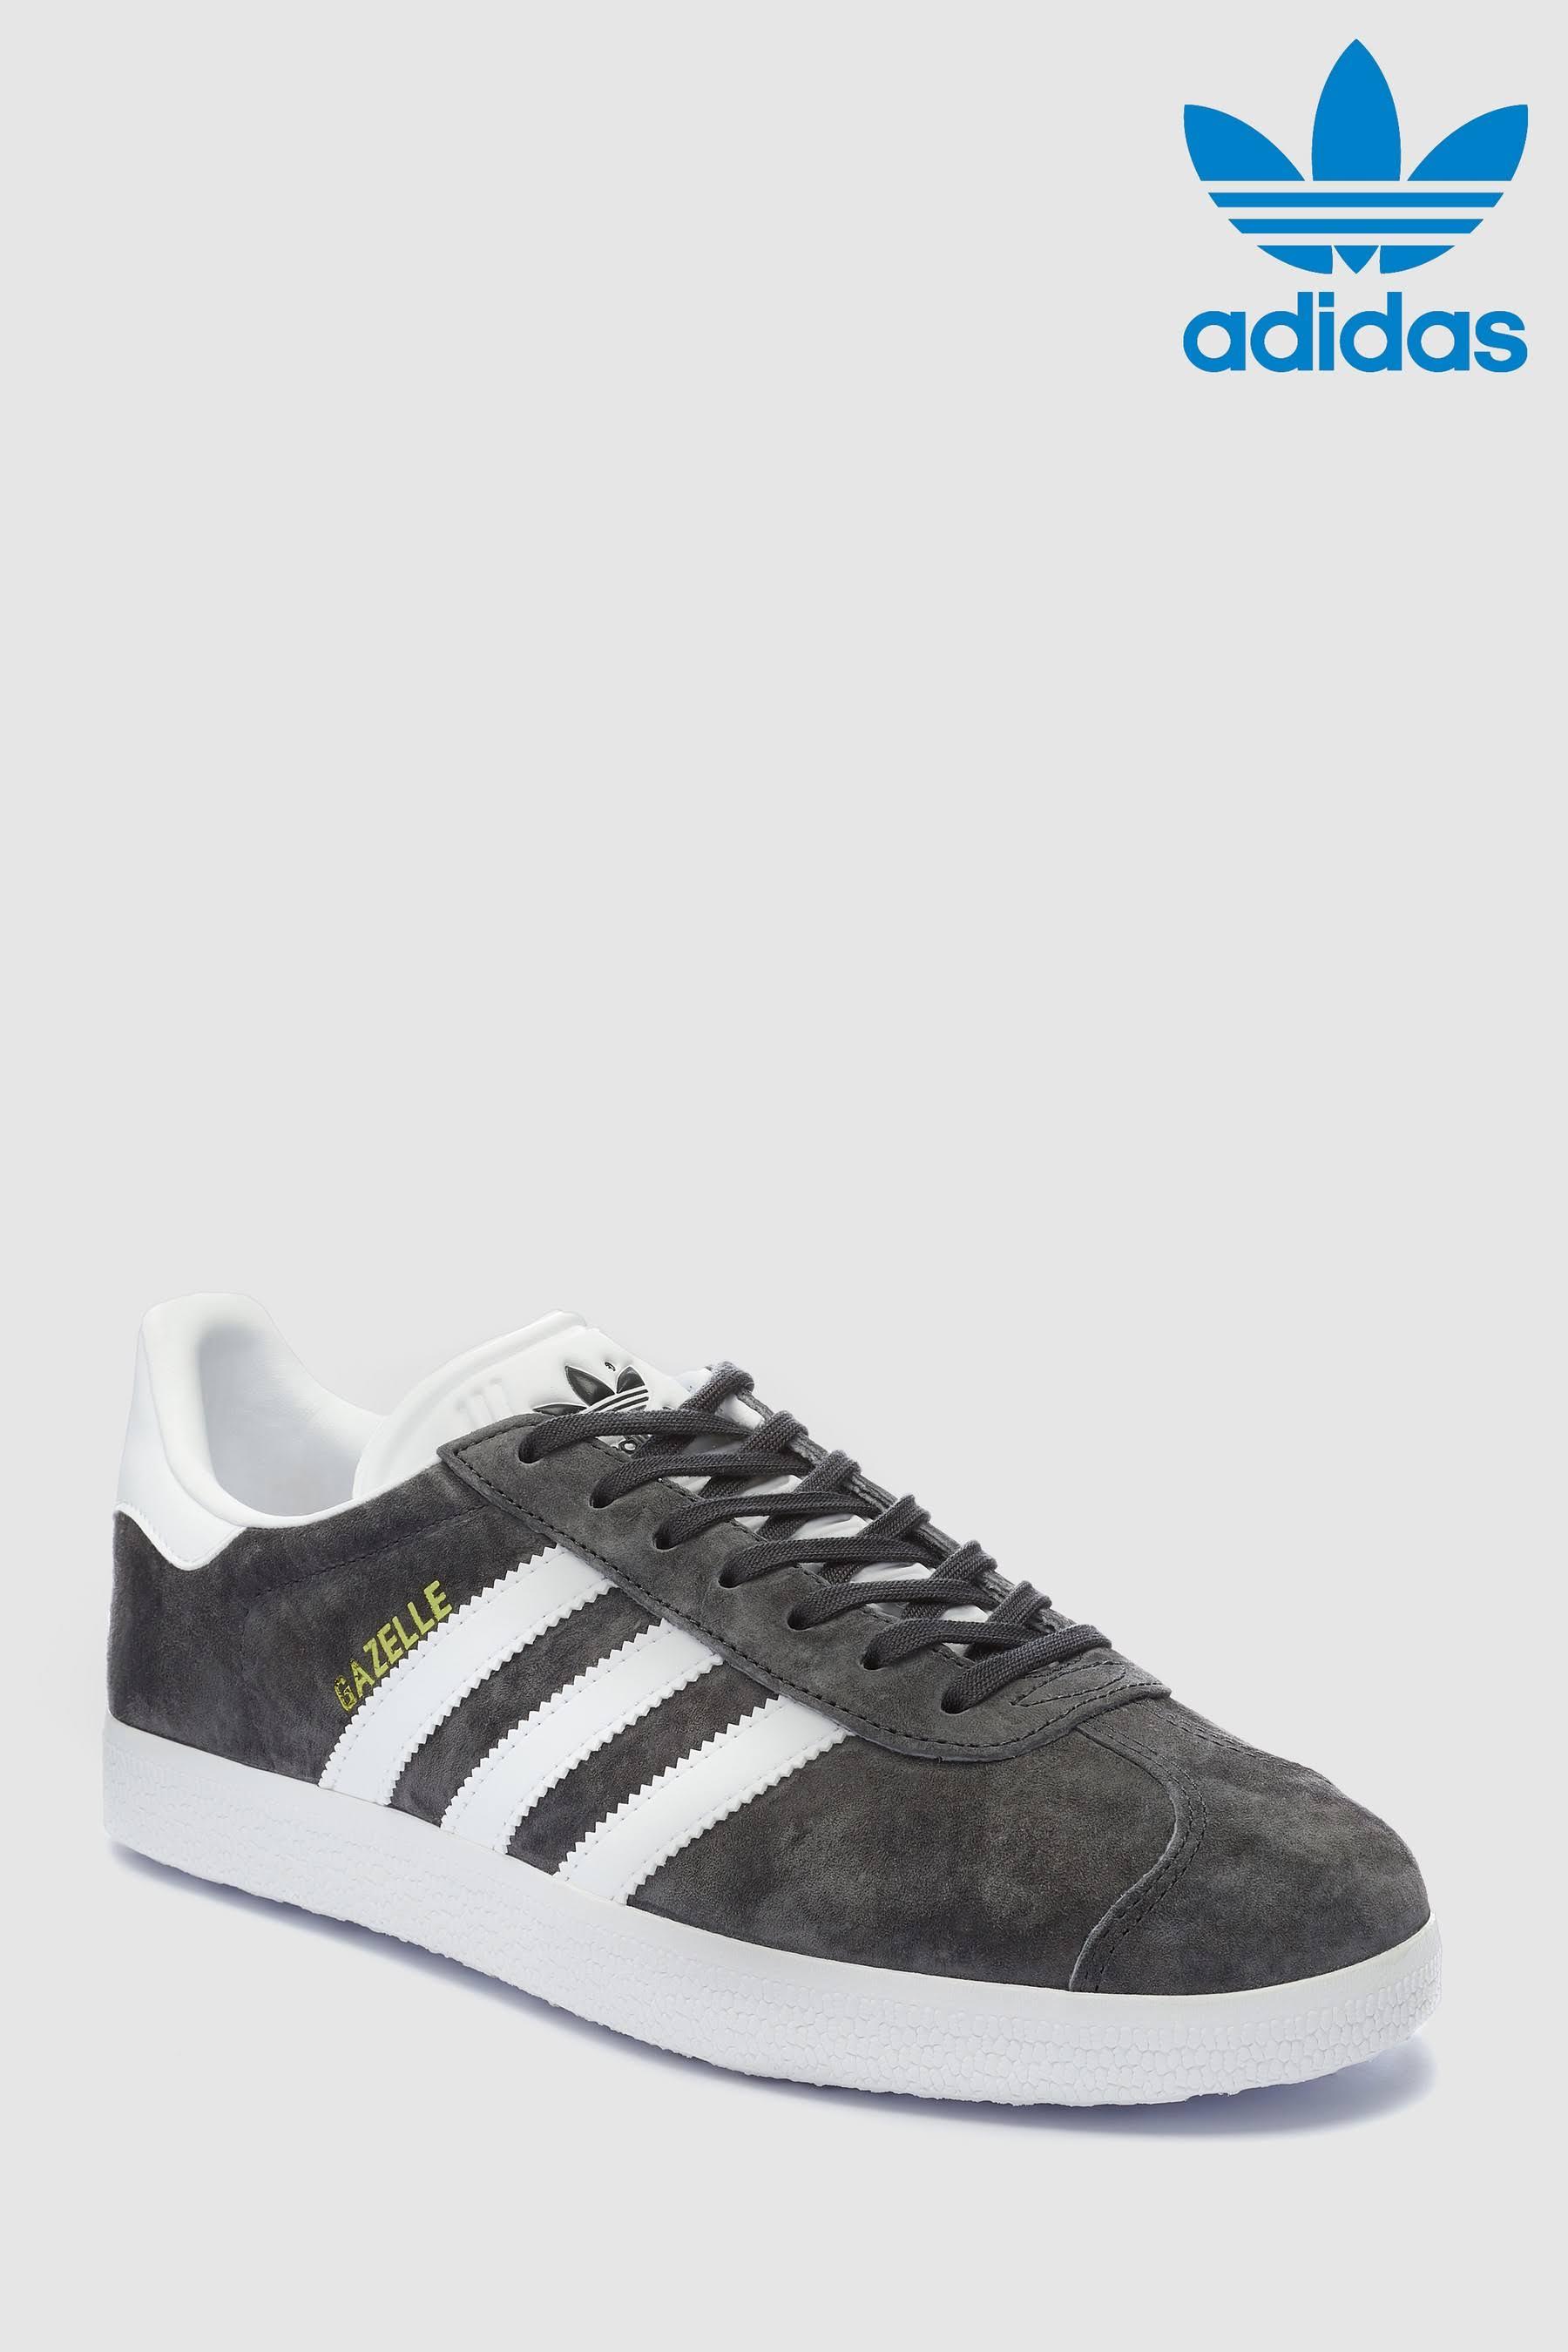 white Gazelle Dghsolidgrey Adidas Bb5480 10 Shoes 0 goldmet Y54qfaw